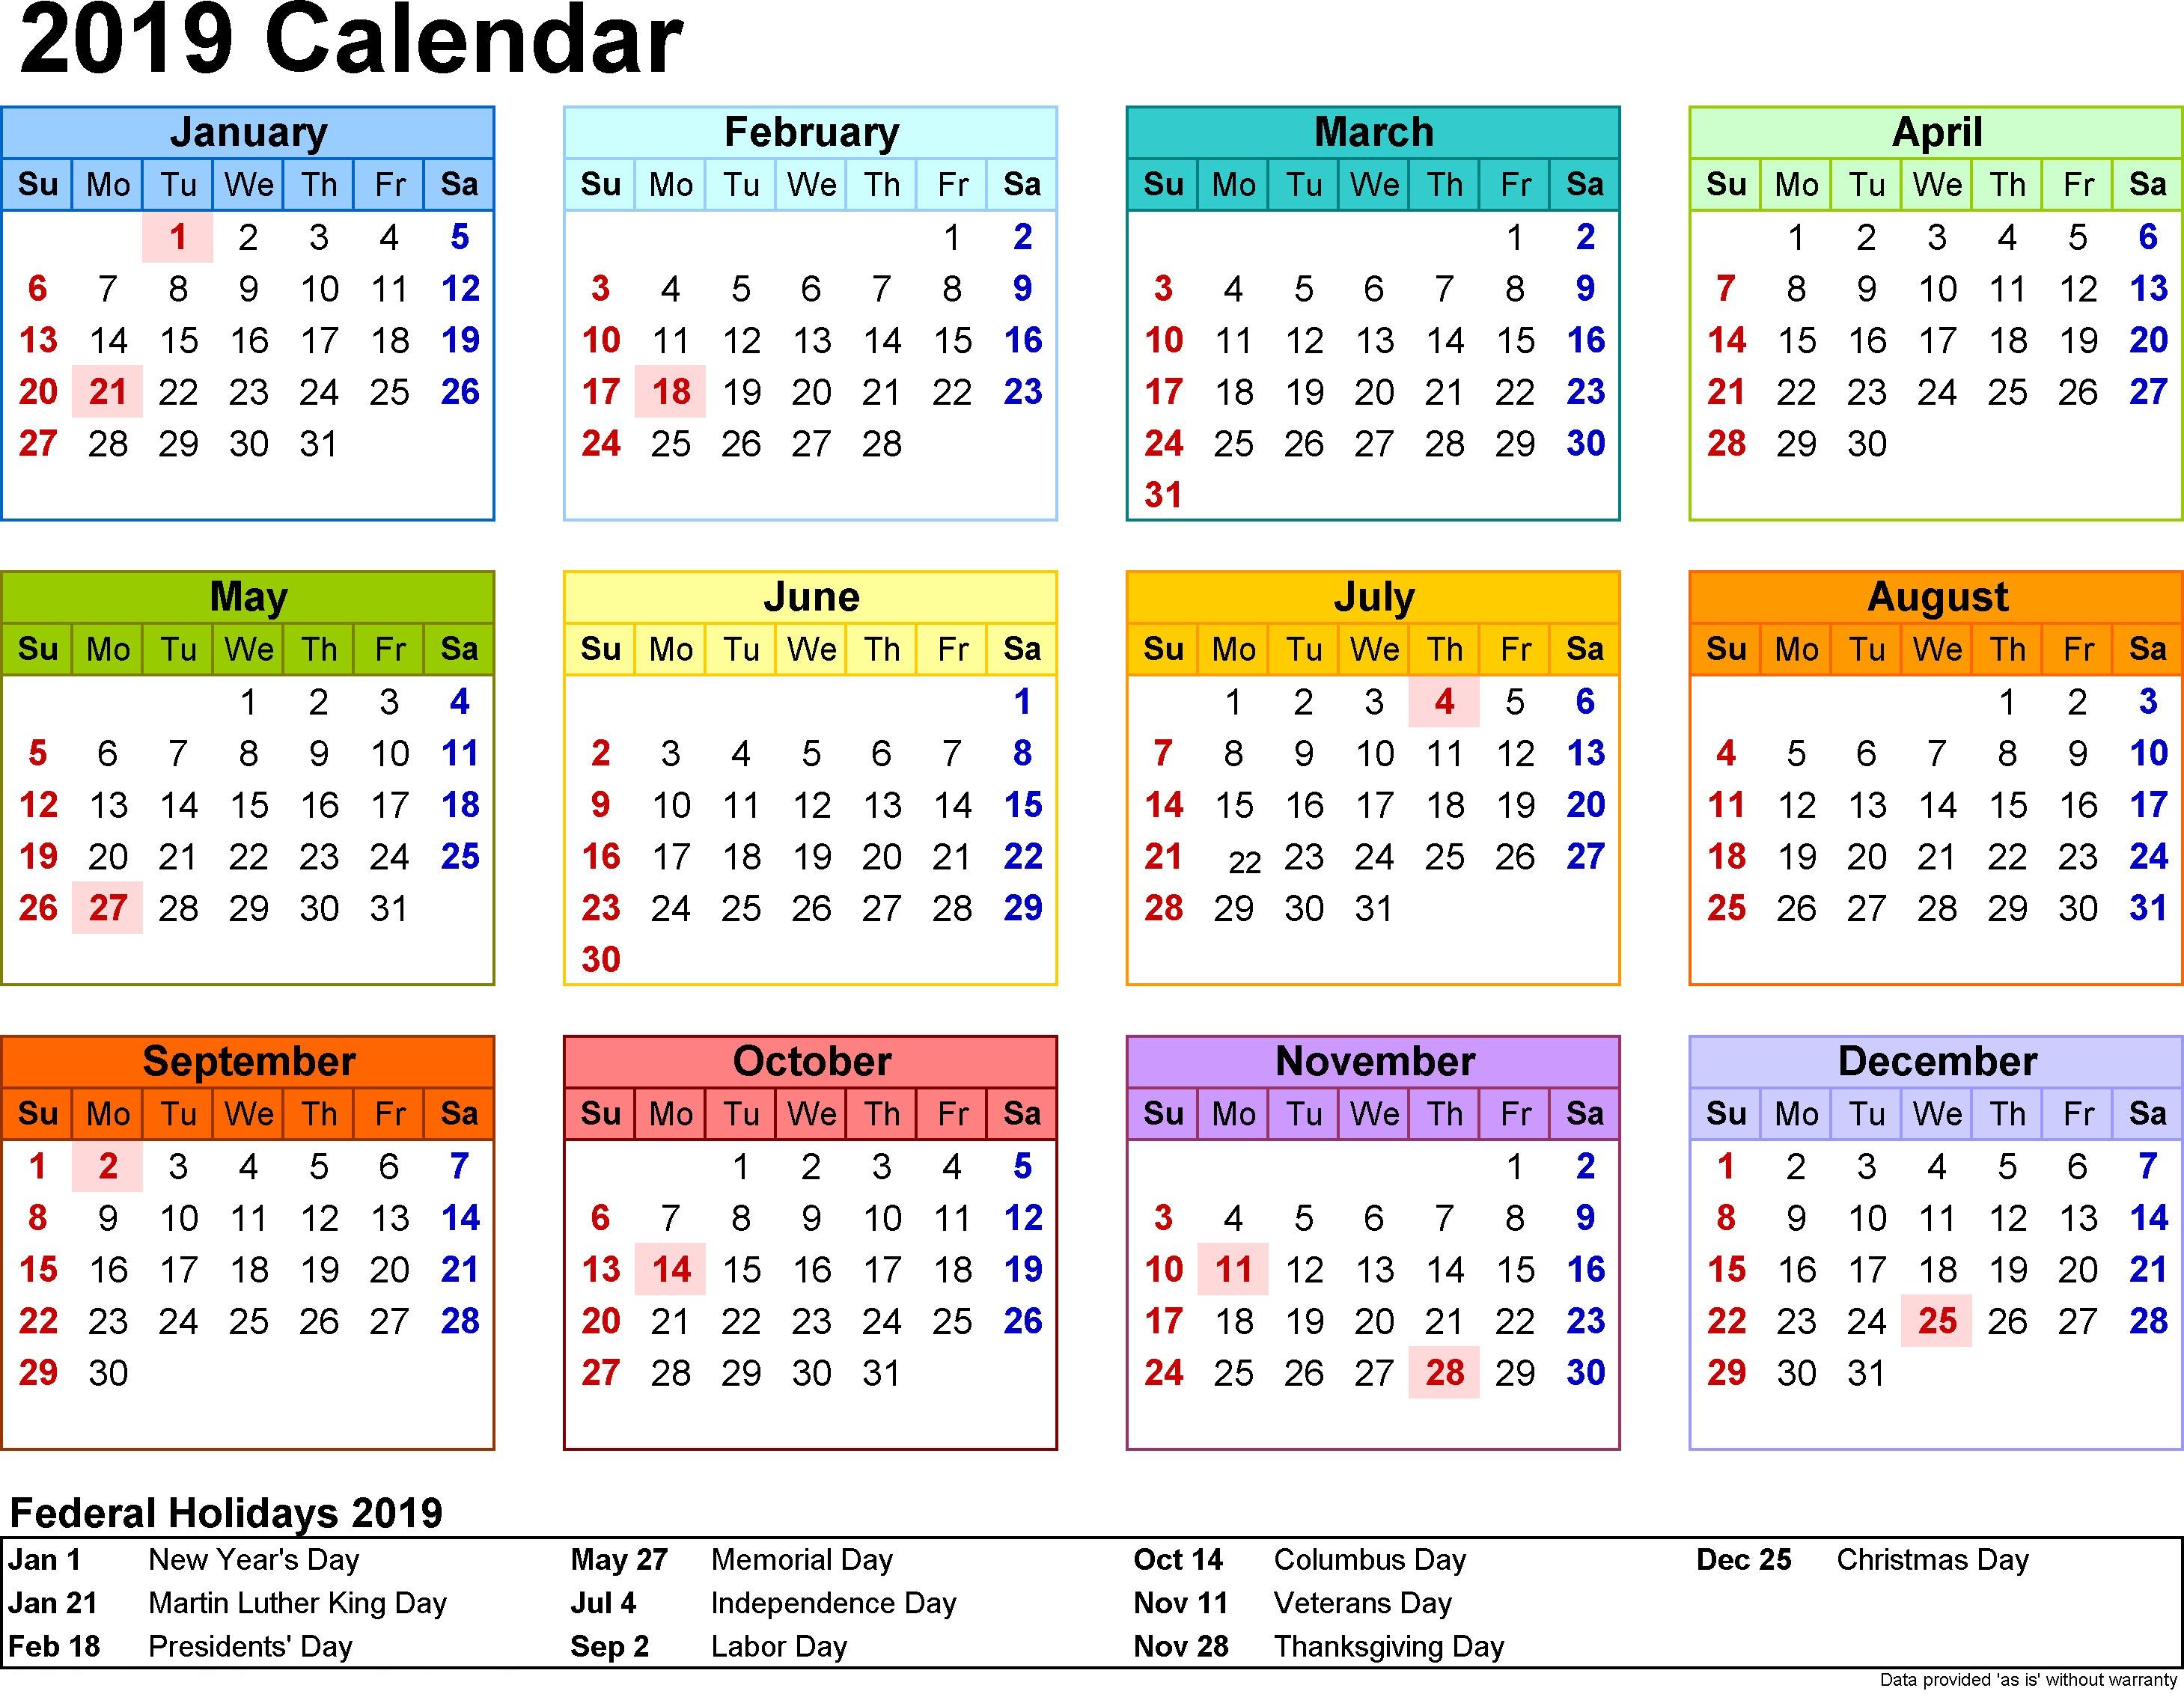 Calendar 2019 with UK Holidays